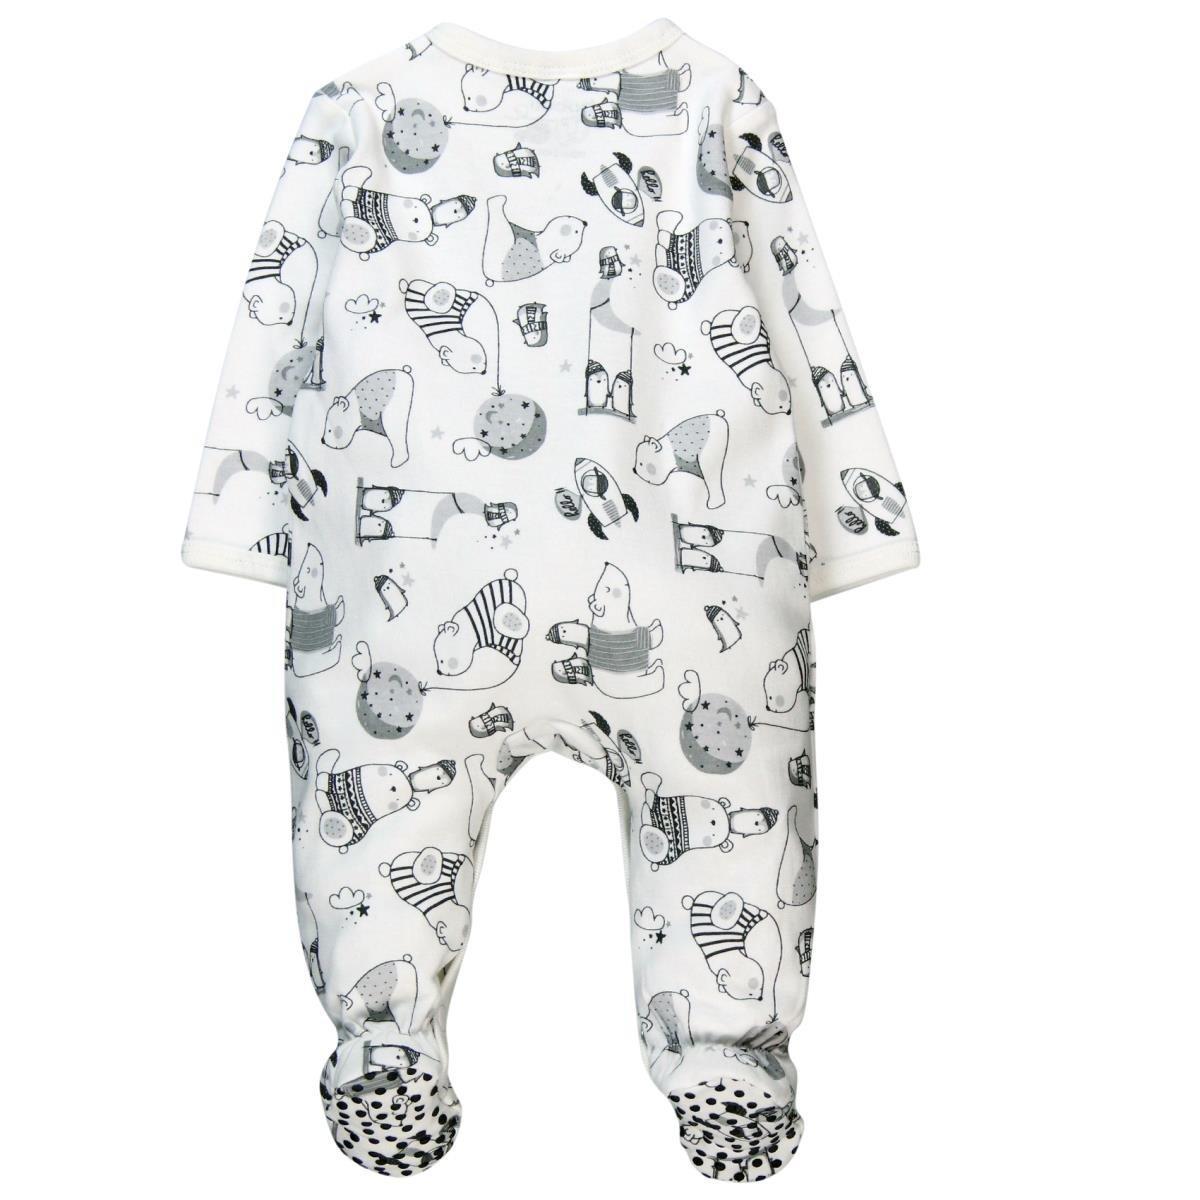 boboli Interlock Play Suit for Baby Barboteuse Mixte b/éb/é